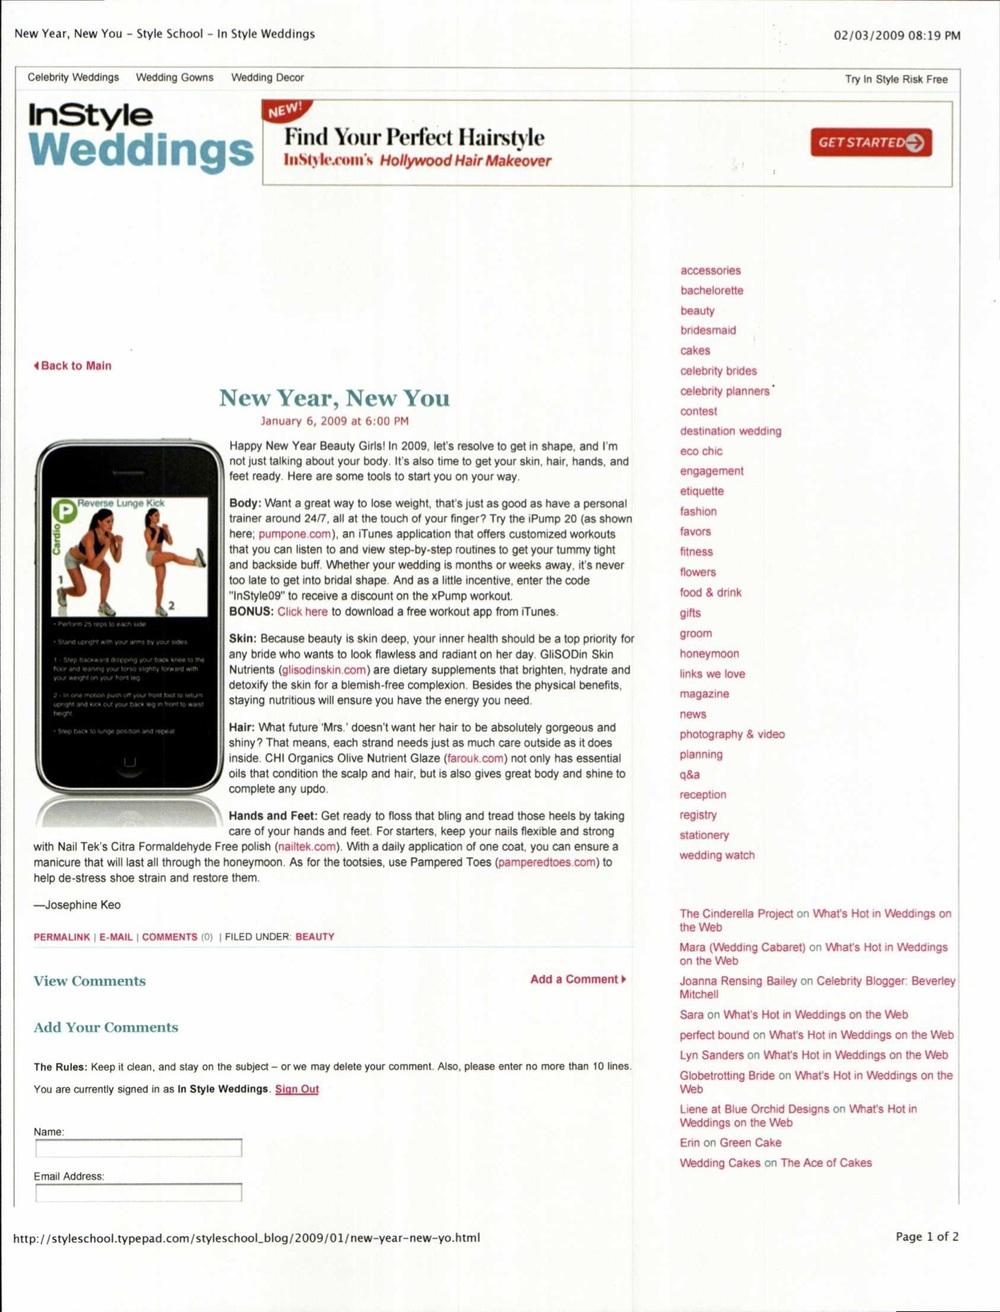 2009 01.06_InStyle_Specials_Blog_4.jpg